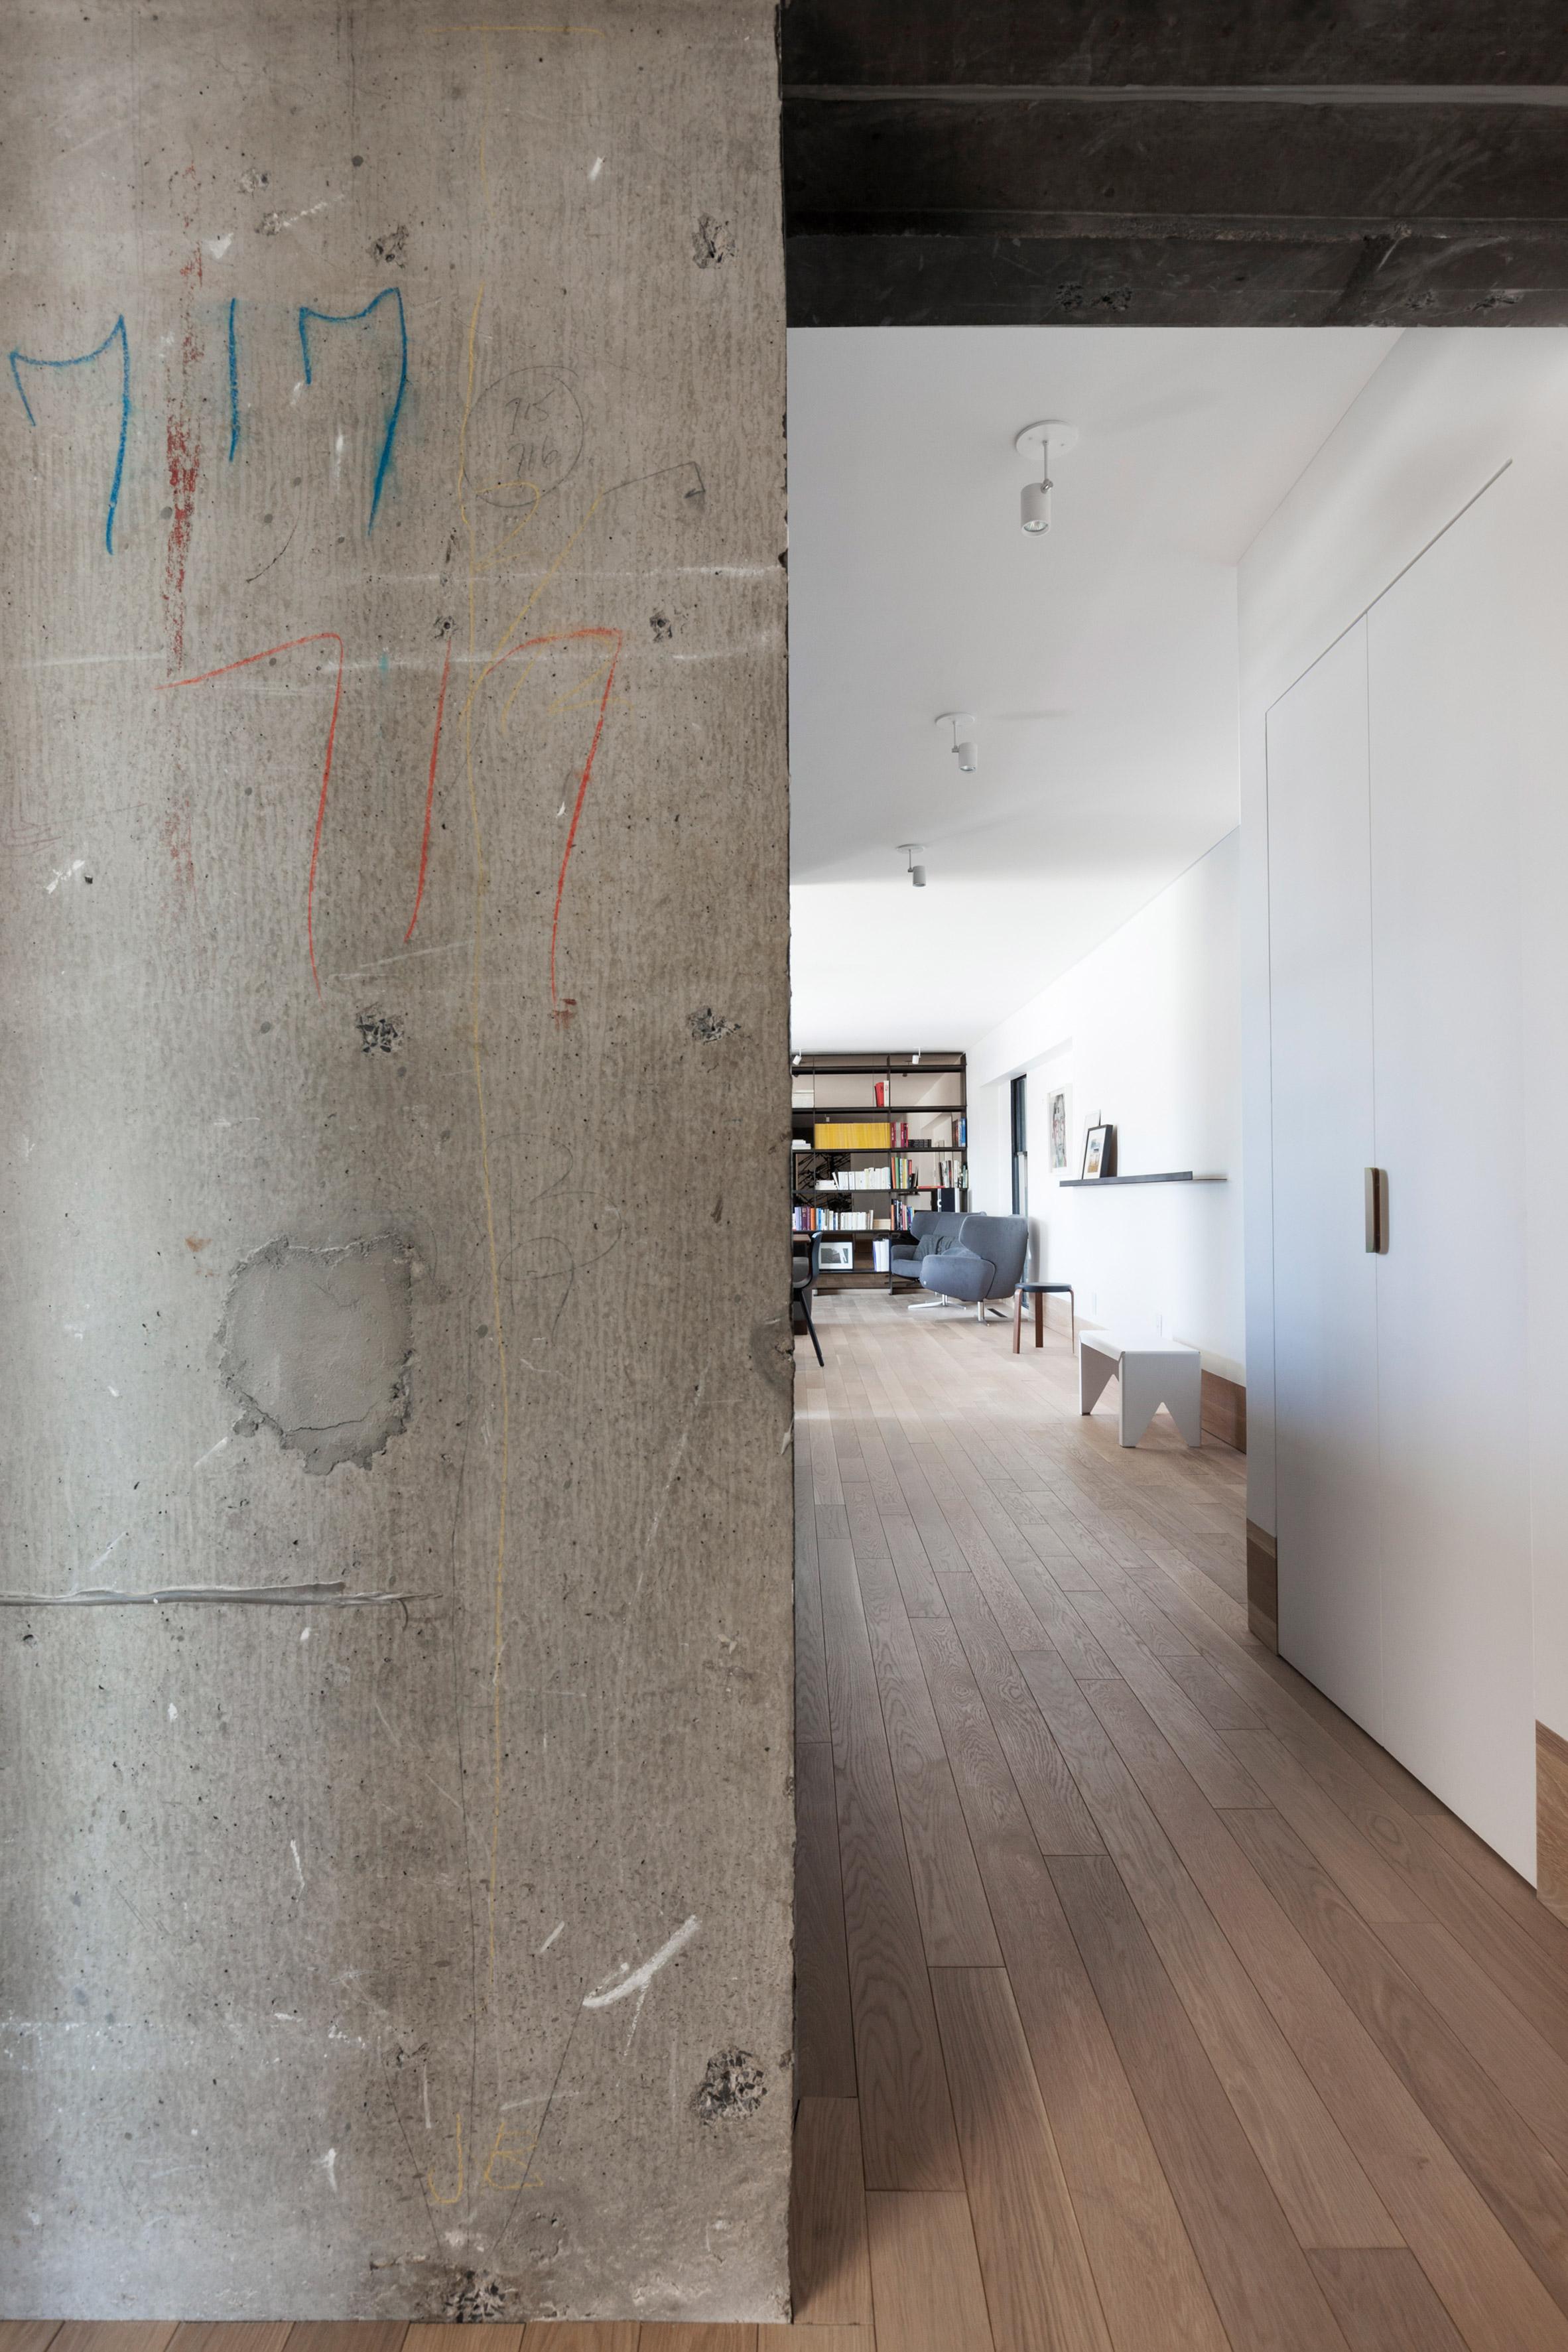 Apartment in Habitat 67 by Rainville Sangaré